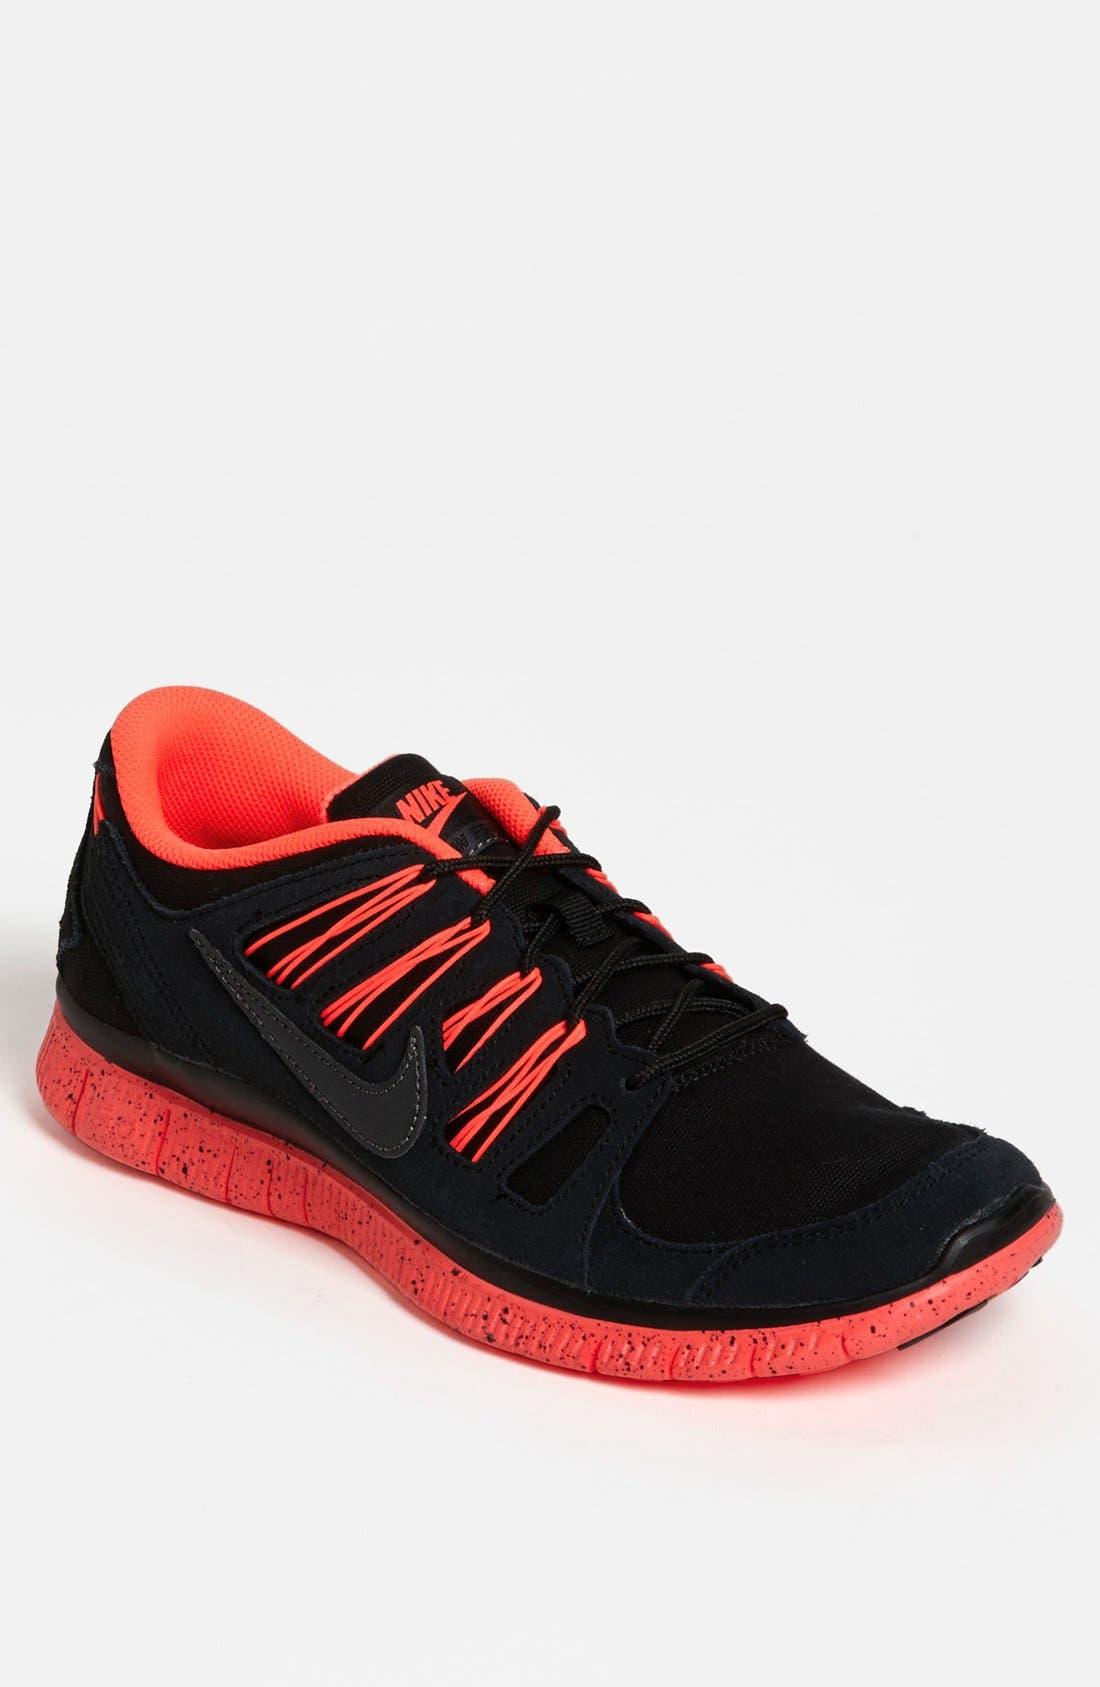 Main Image - Nike 'Free 5.0 EXT' Sneaker (Men)